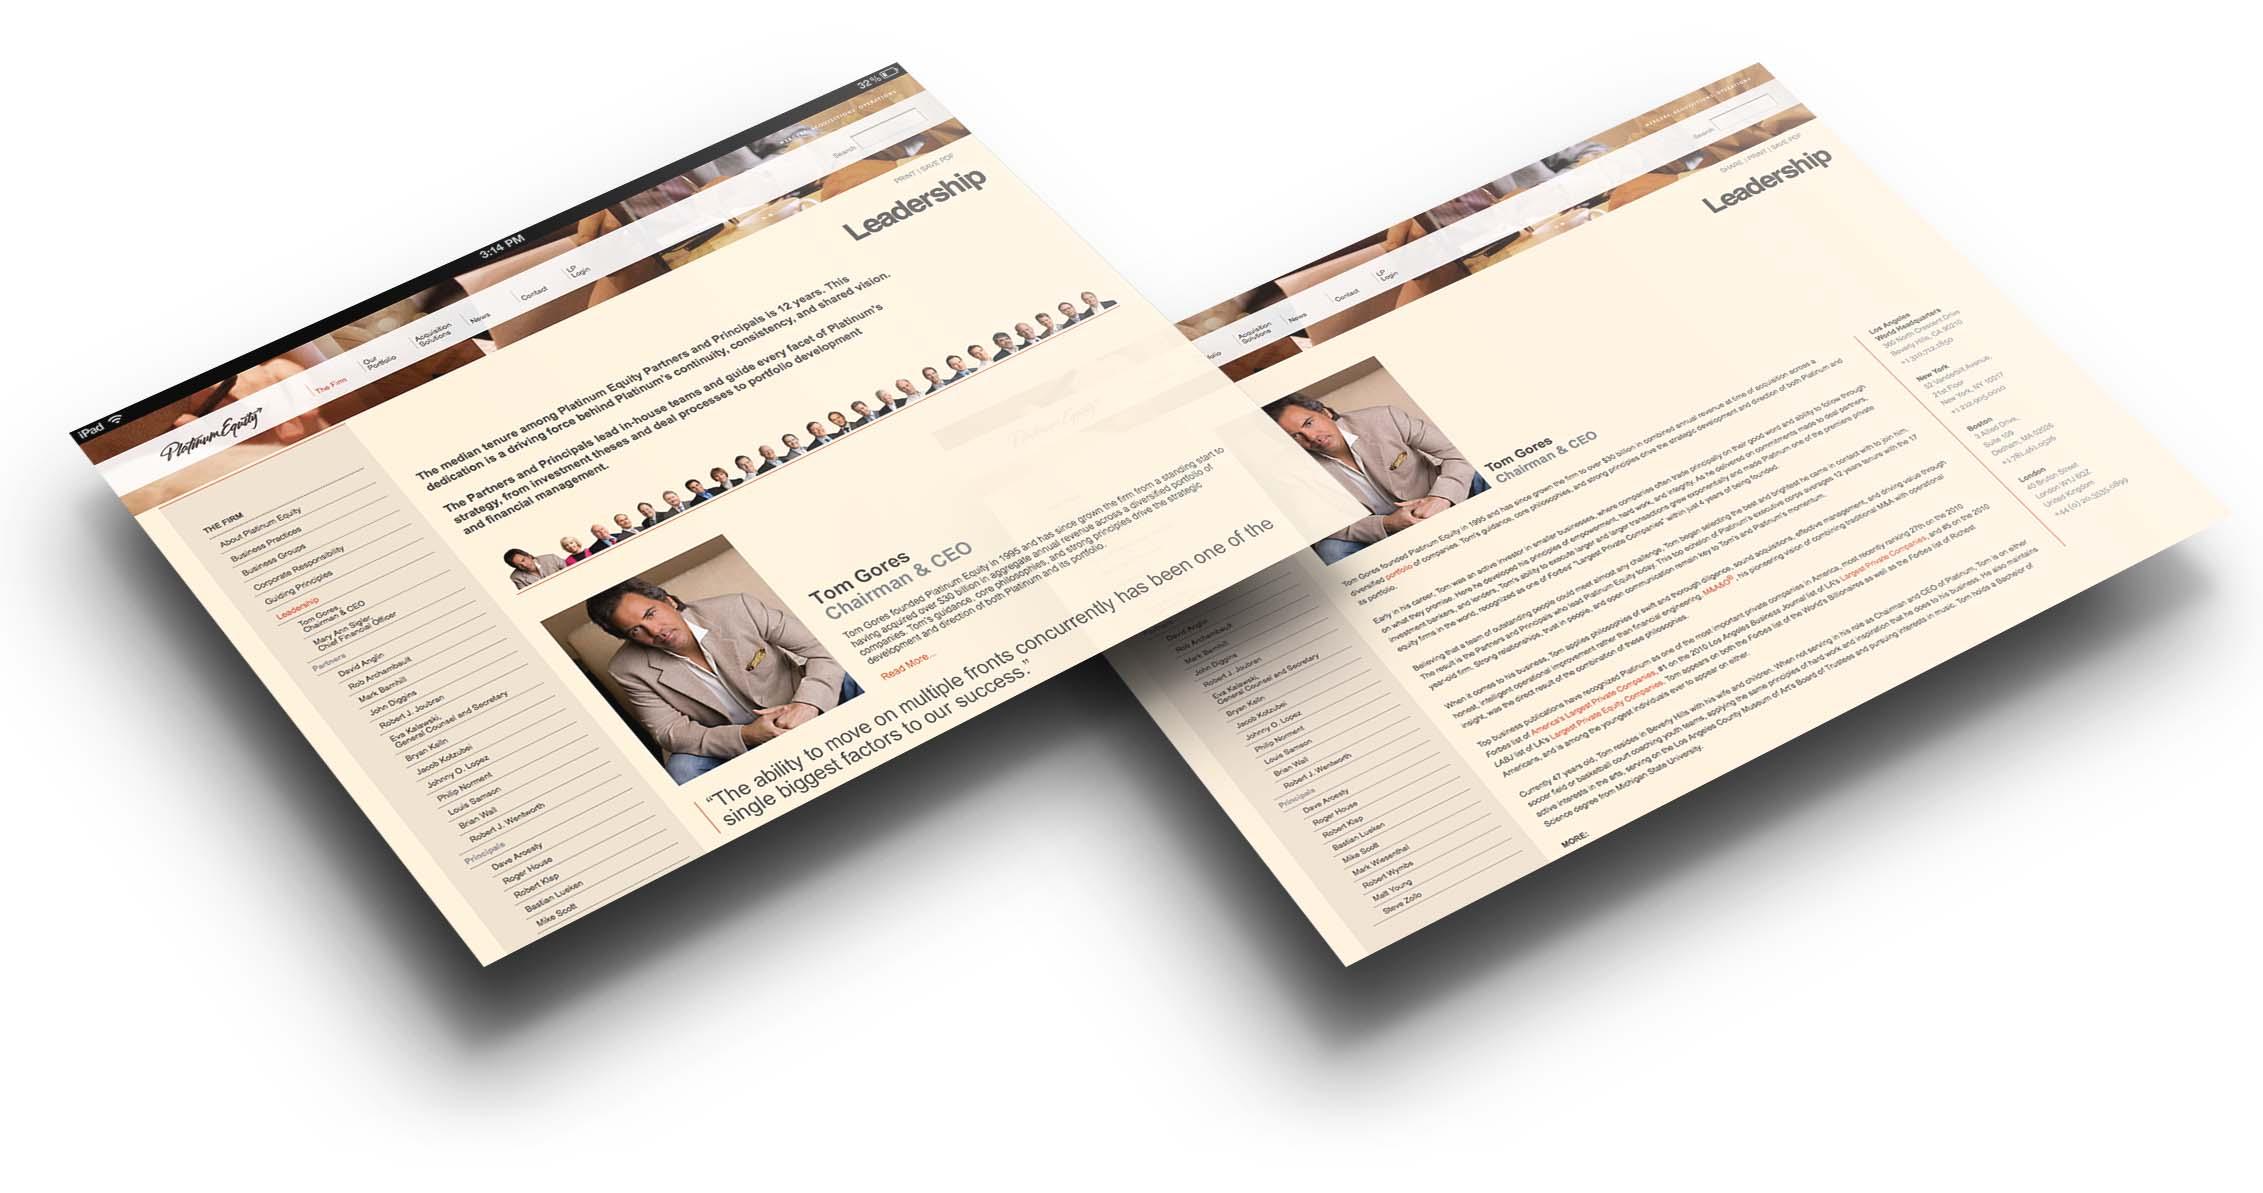 yyes-platinum-equity-leadership-multiscreen_1